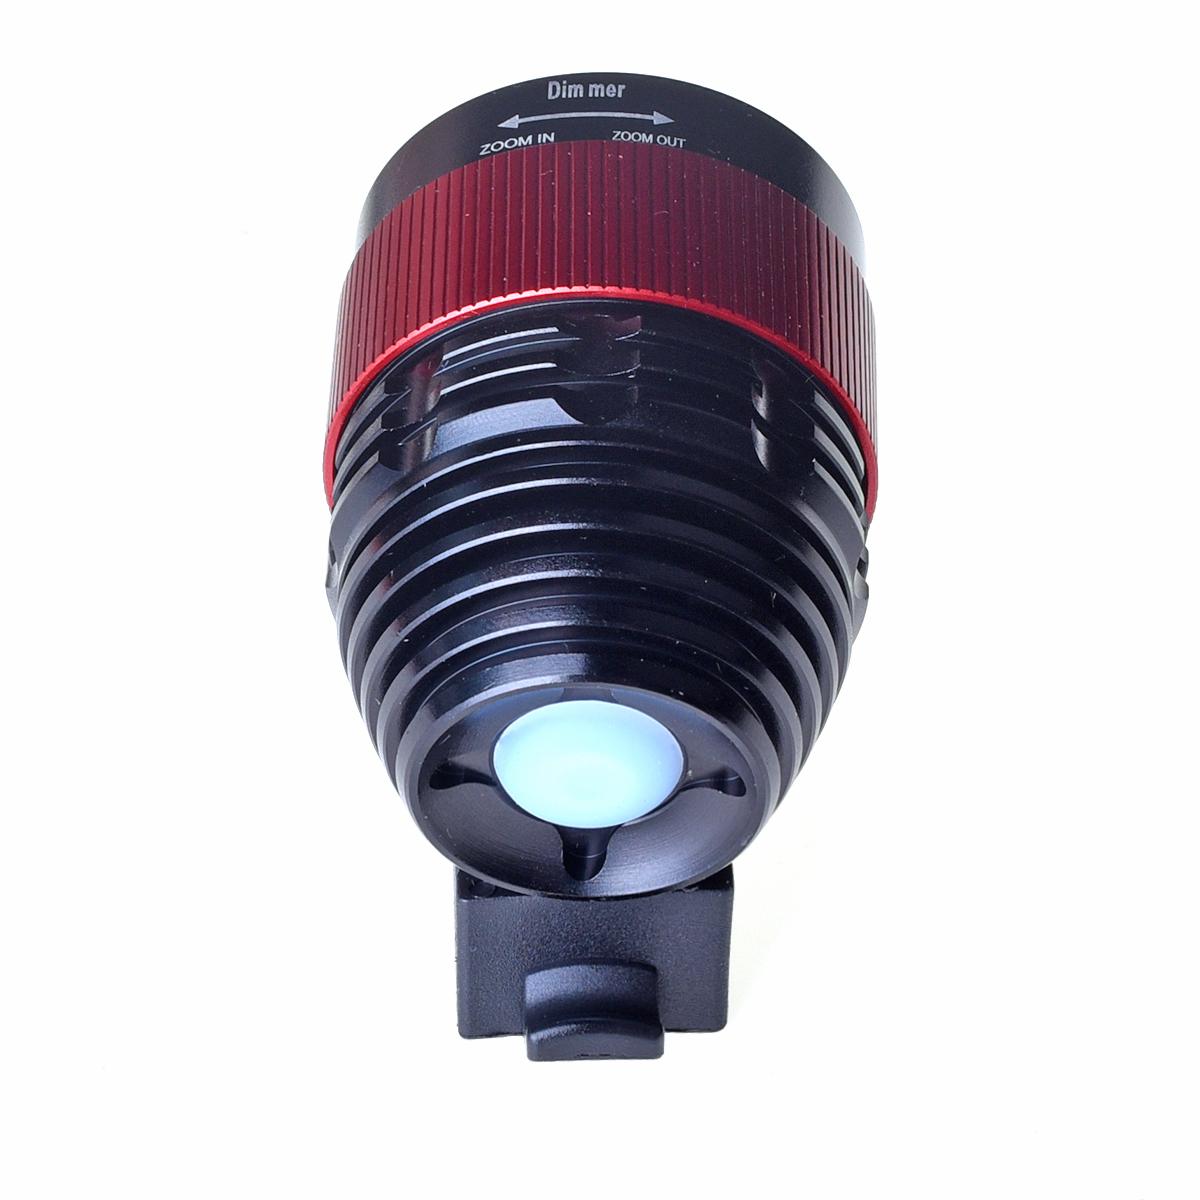 3000 lumen xml t6 led 3 mode headlamp headlight light zoom. Black Bedroom Furniture Sets. Home Design Ideas